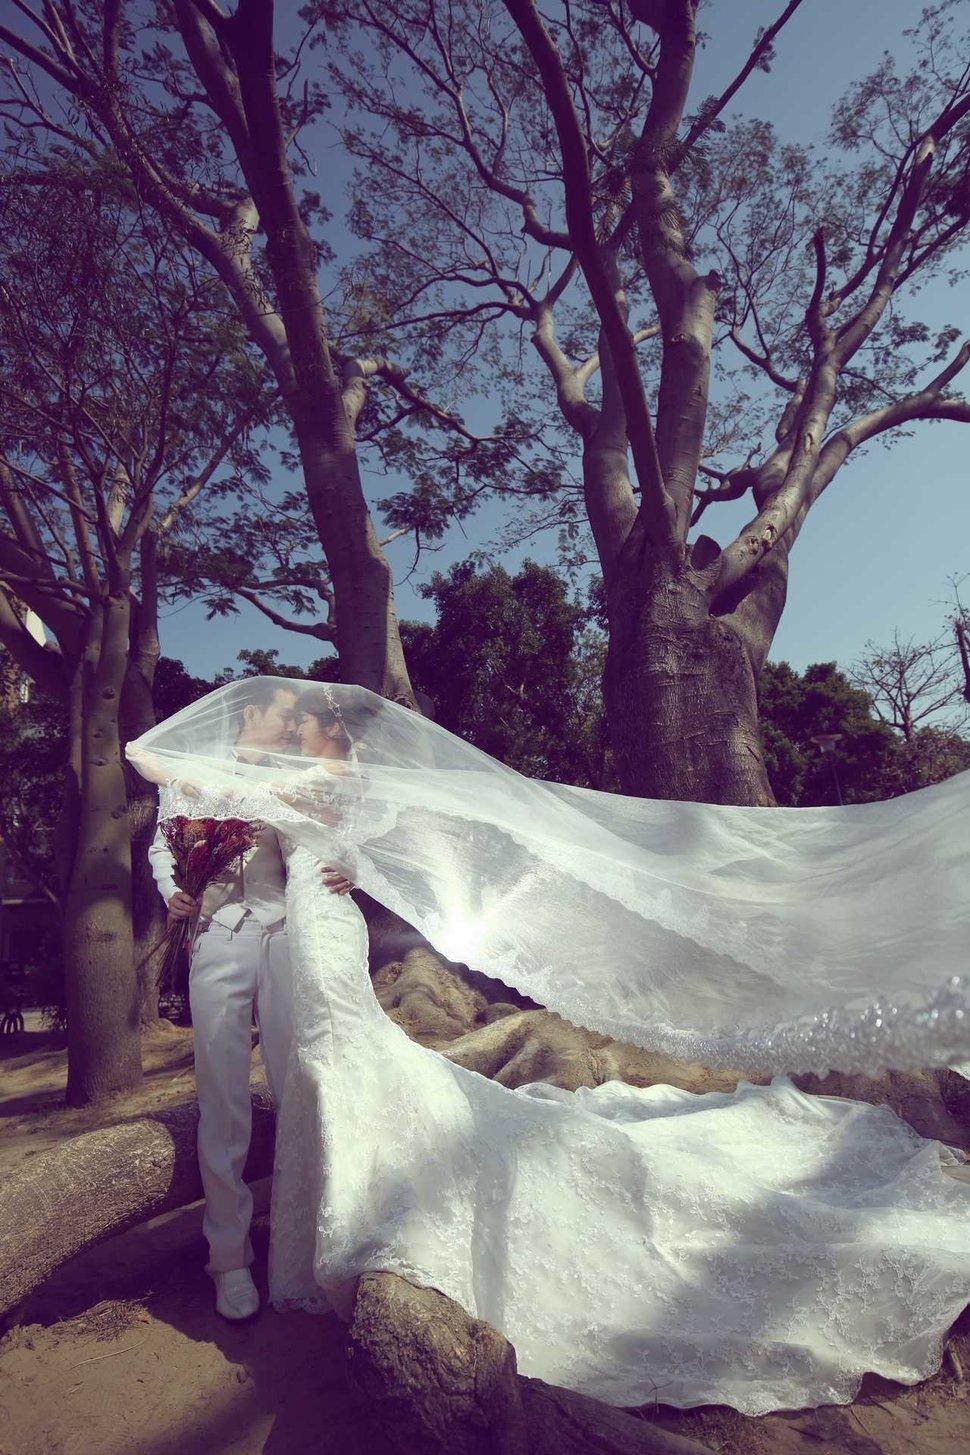 Wedding_Photo_2016_005 - 台南新秘Penny-新娘秘書《結婚吧》